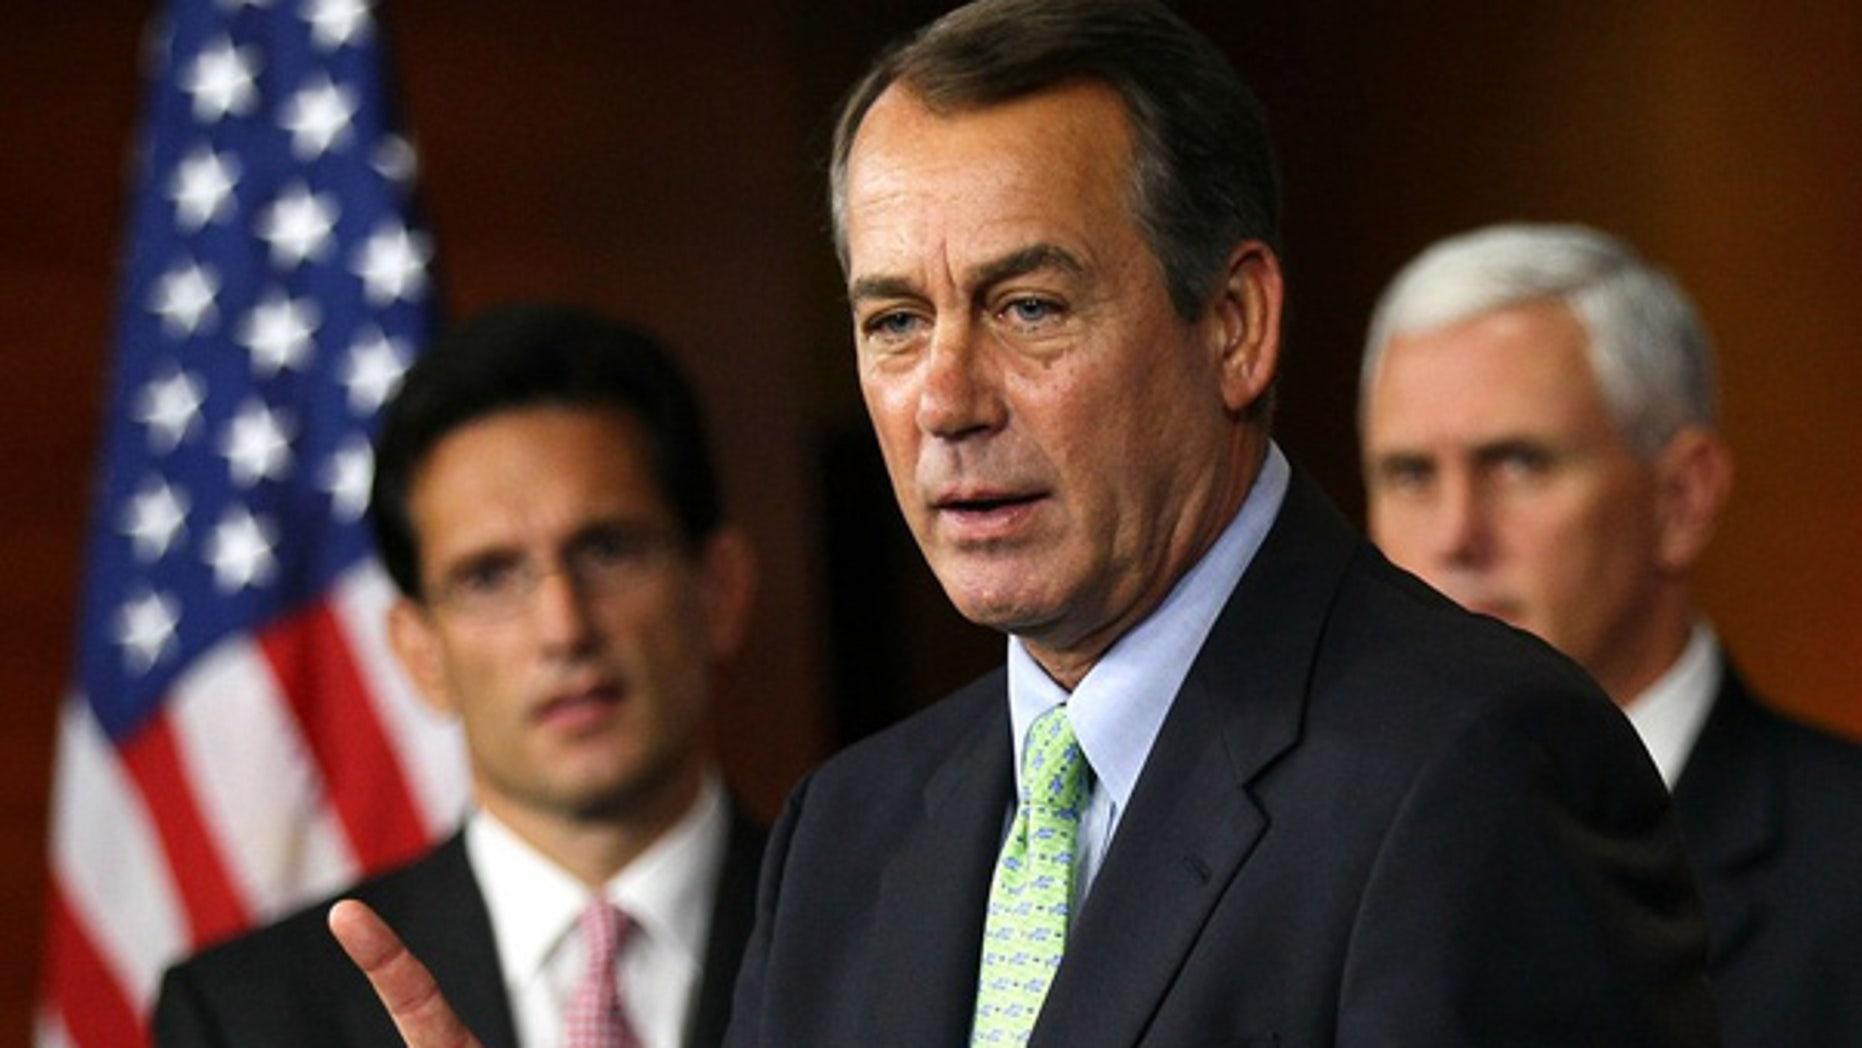 Sept. 29: Minority Leader Rep. John Boehner speaks as House Minority Whip Rep. Eric Cantor and Rep. Mike Pence listen on Capitol Hill.